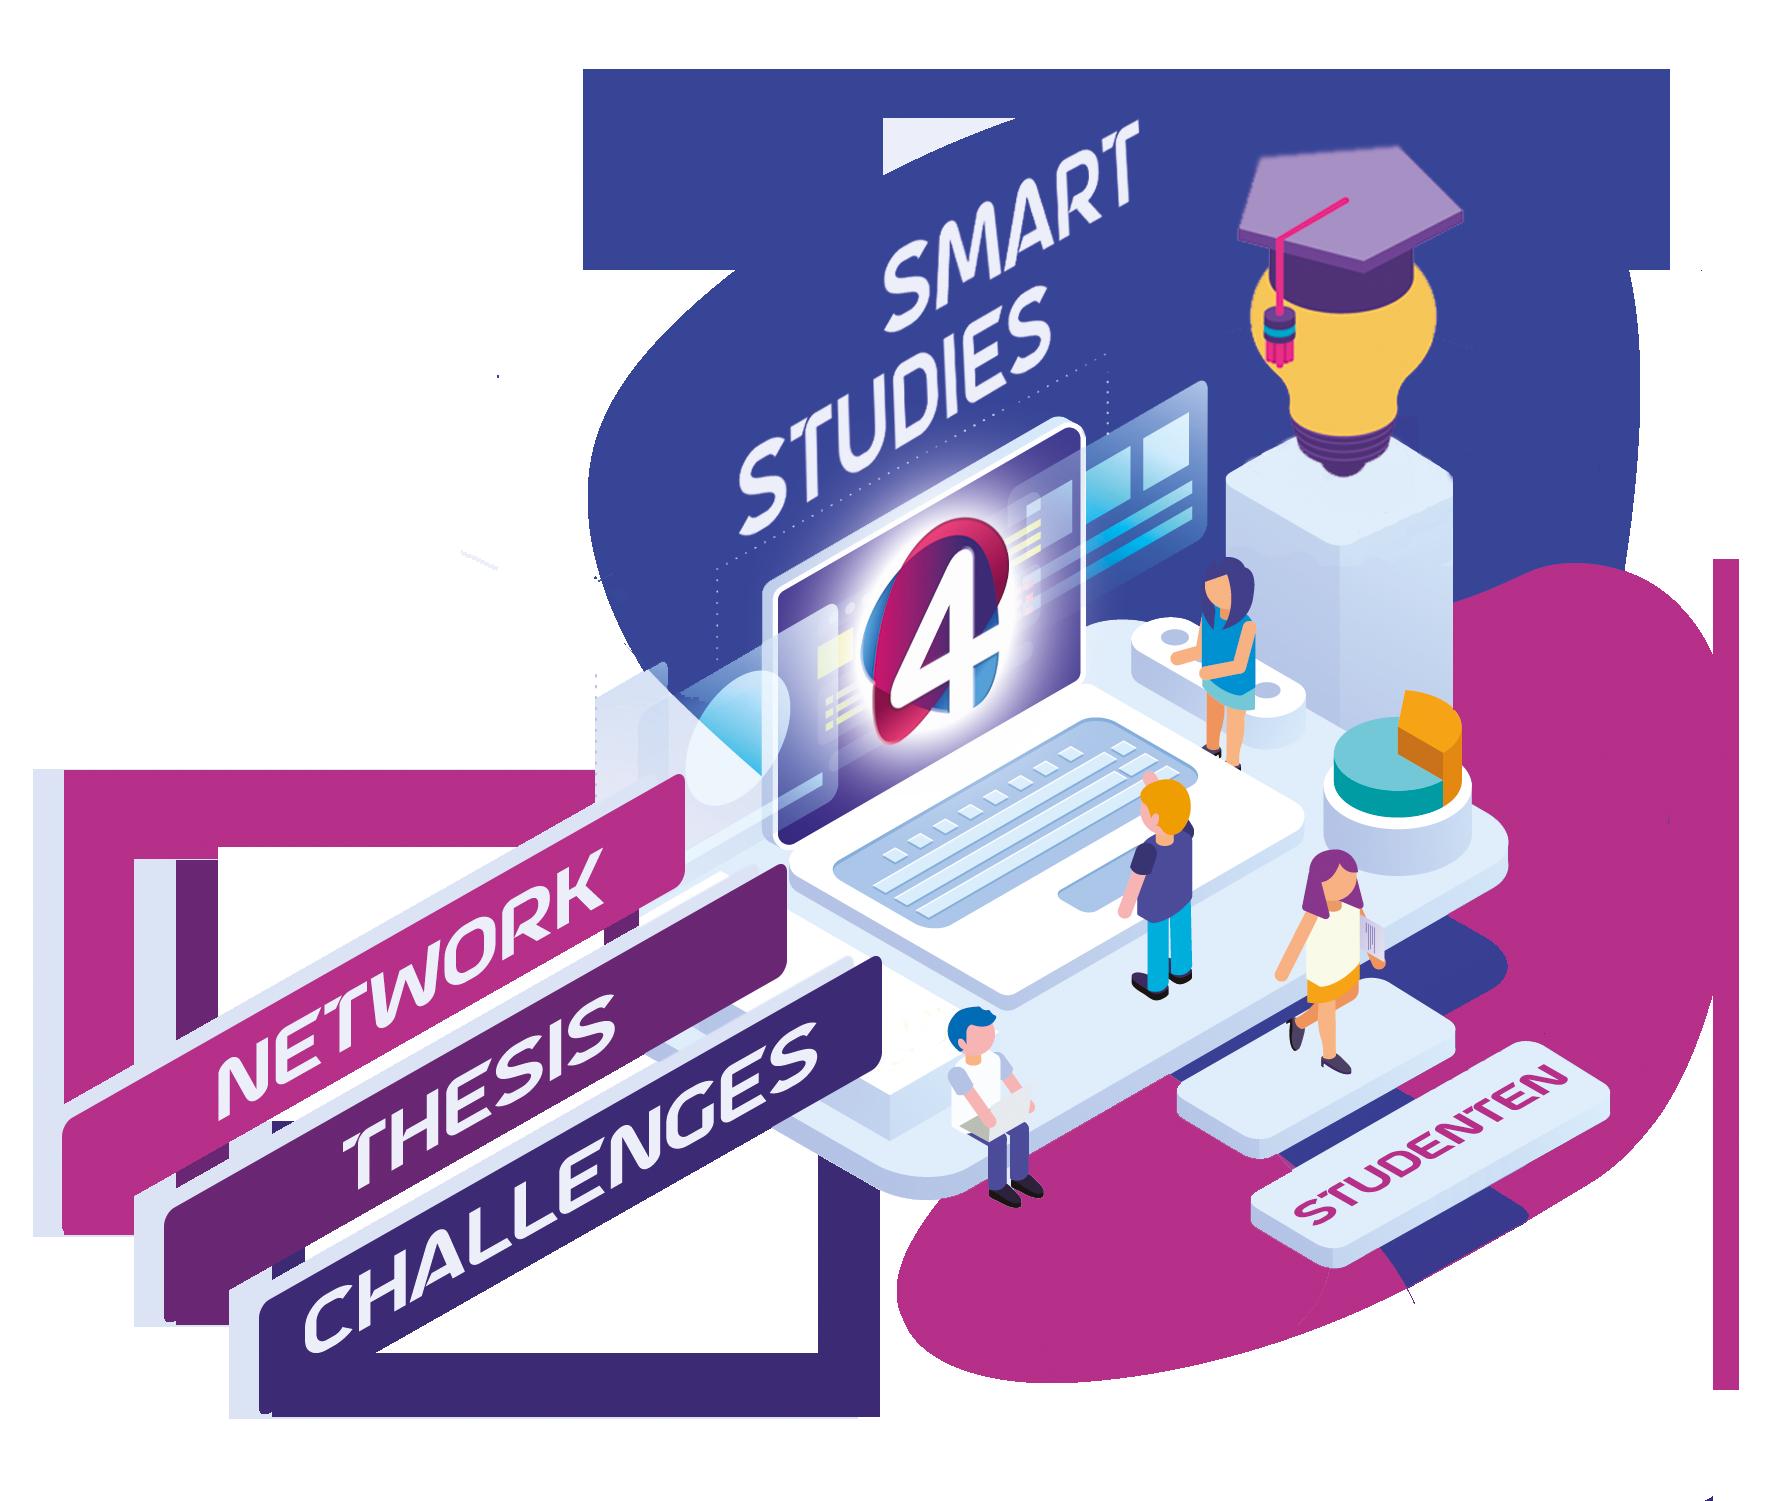 Smart Studies Network Thesis Challenge Studierende